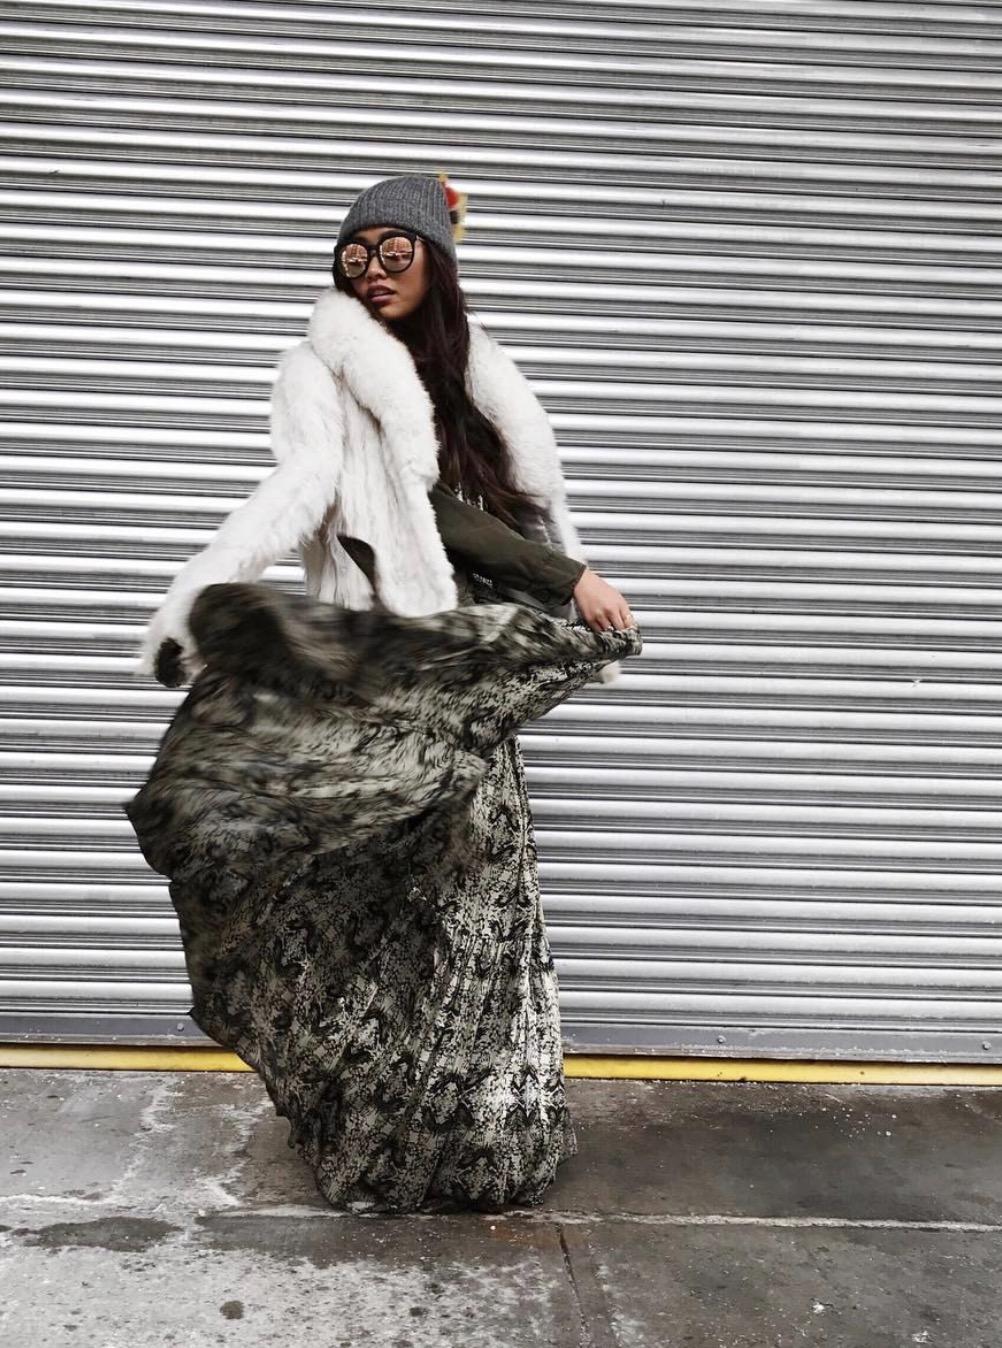 Bianca Diwa / B Scene NYC / 📸 Chester Canasa